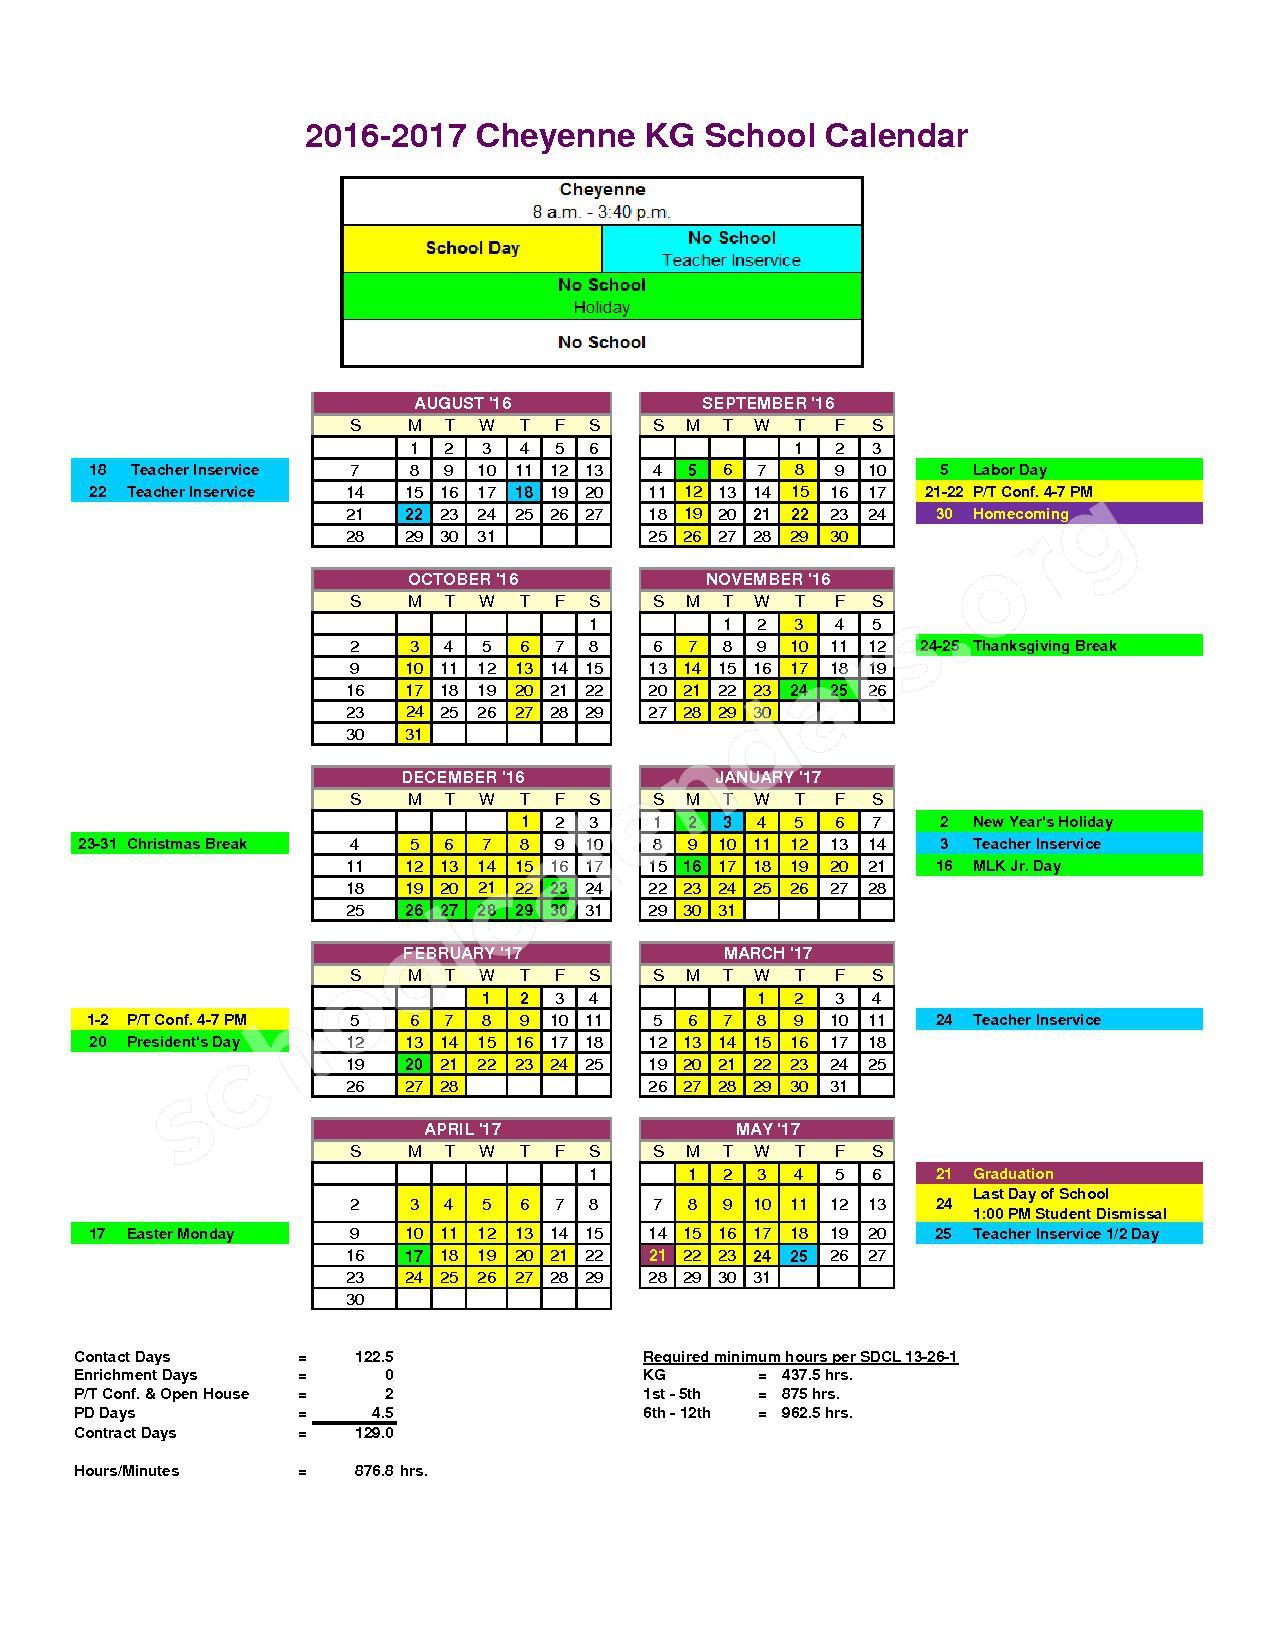 2016 - 2017 School Calendar – Stanley County School District 57-1 – page 1